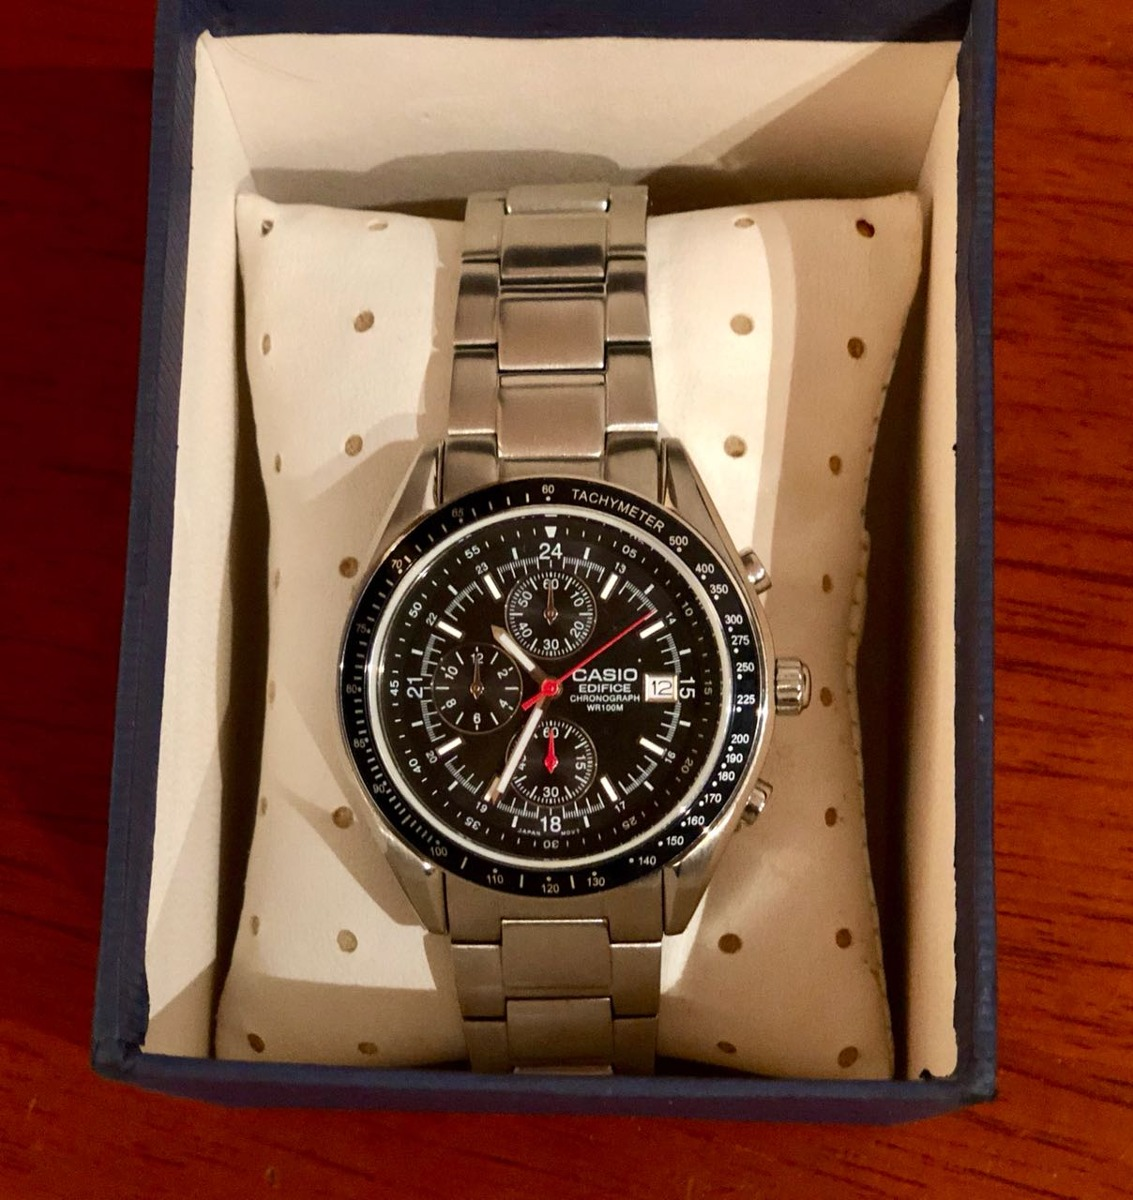 6424017418ea Reloj Casio Edifice Chronograph Wr100m -   300.000 en Mercado Libre